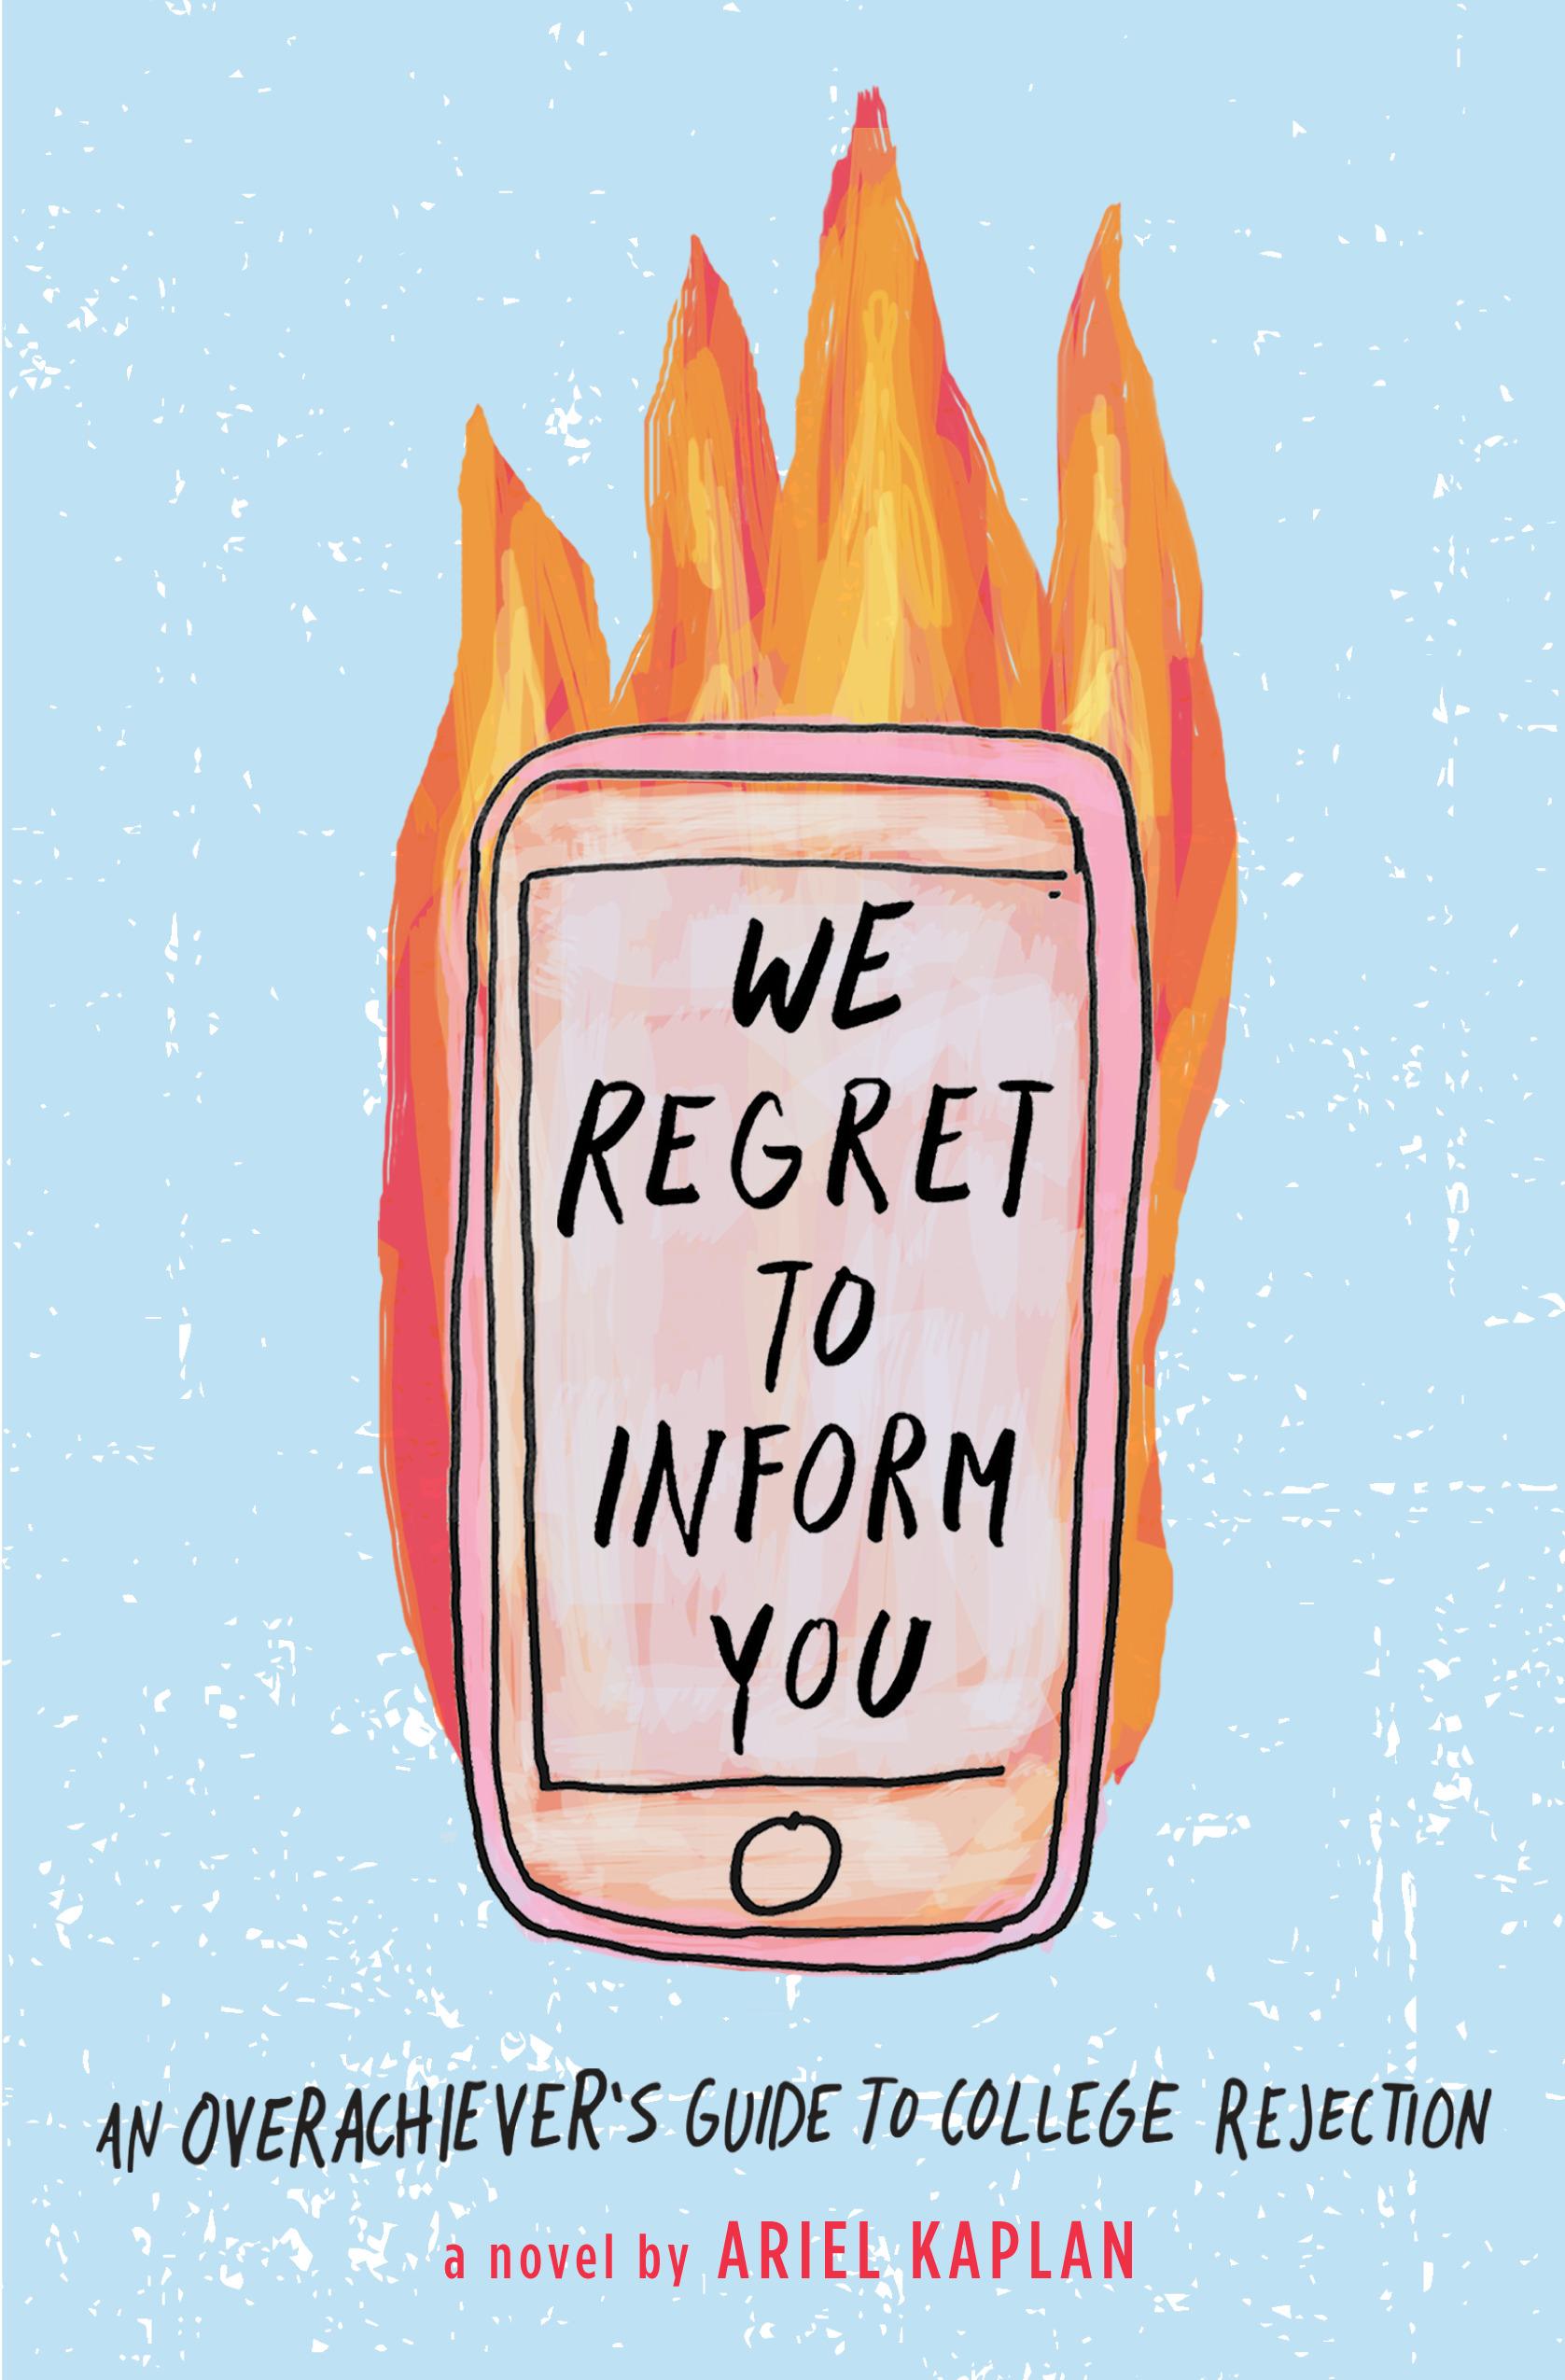 We-Regret-Cover.jpg